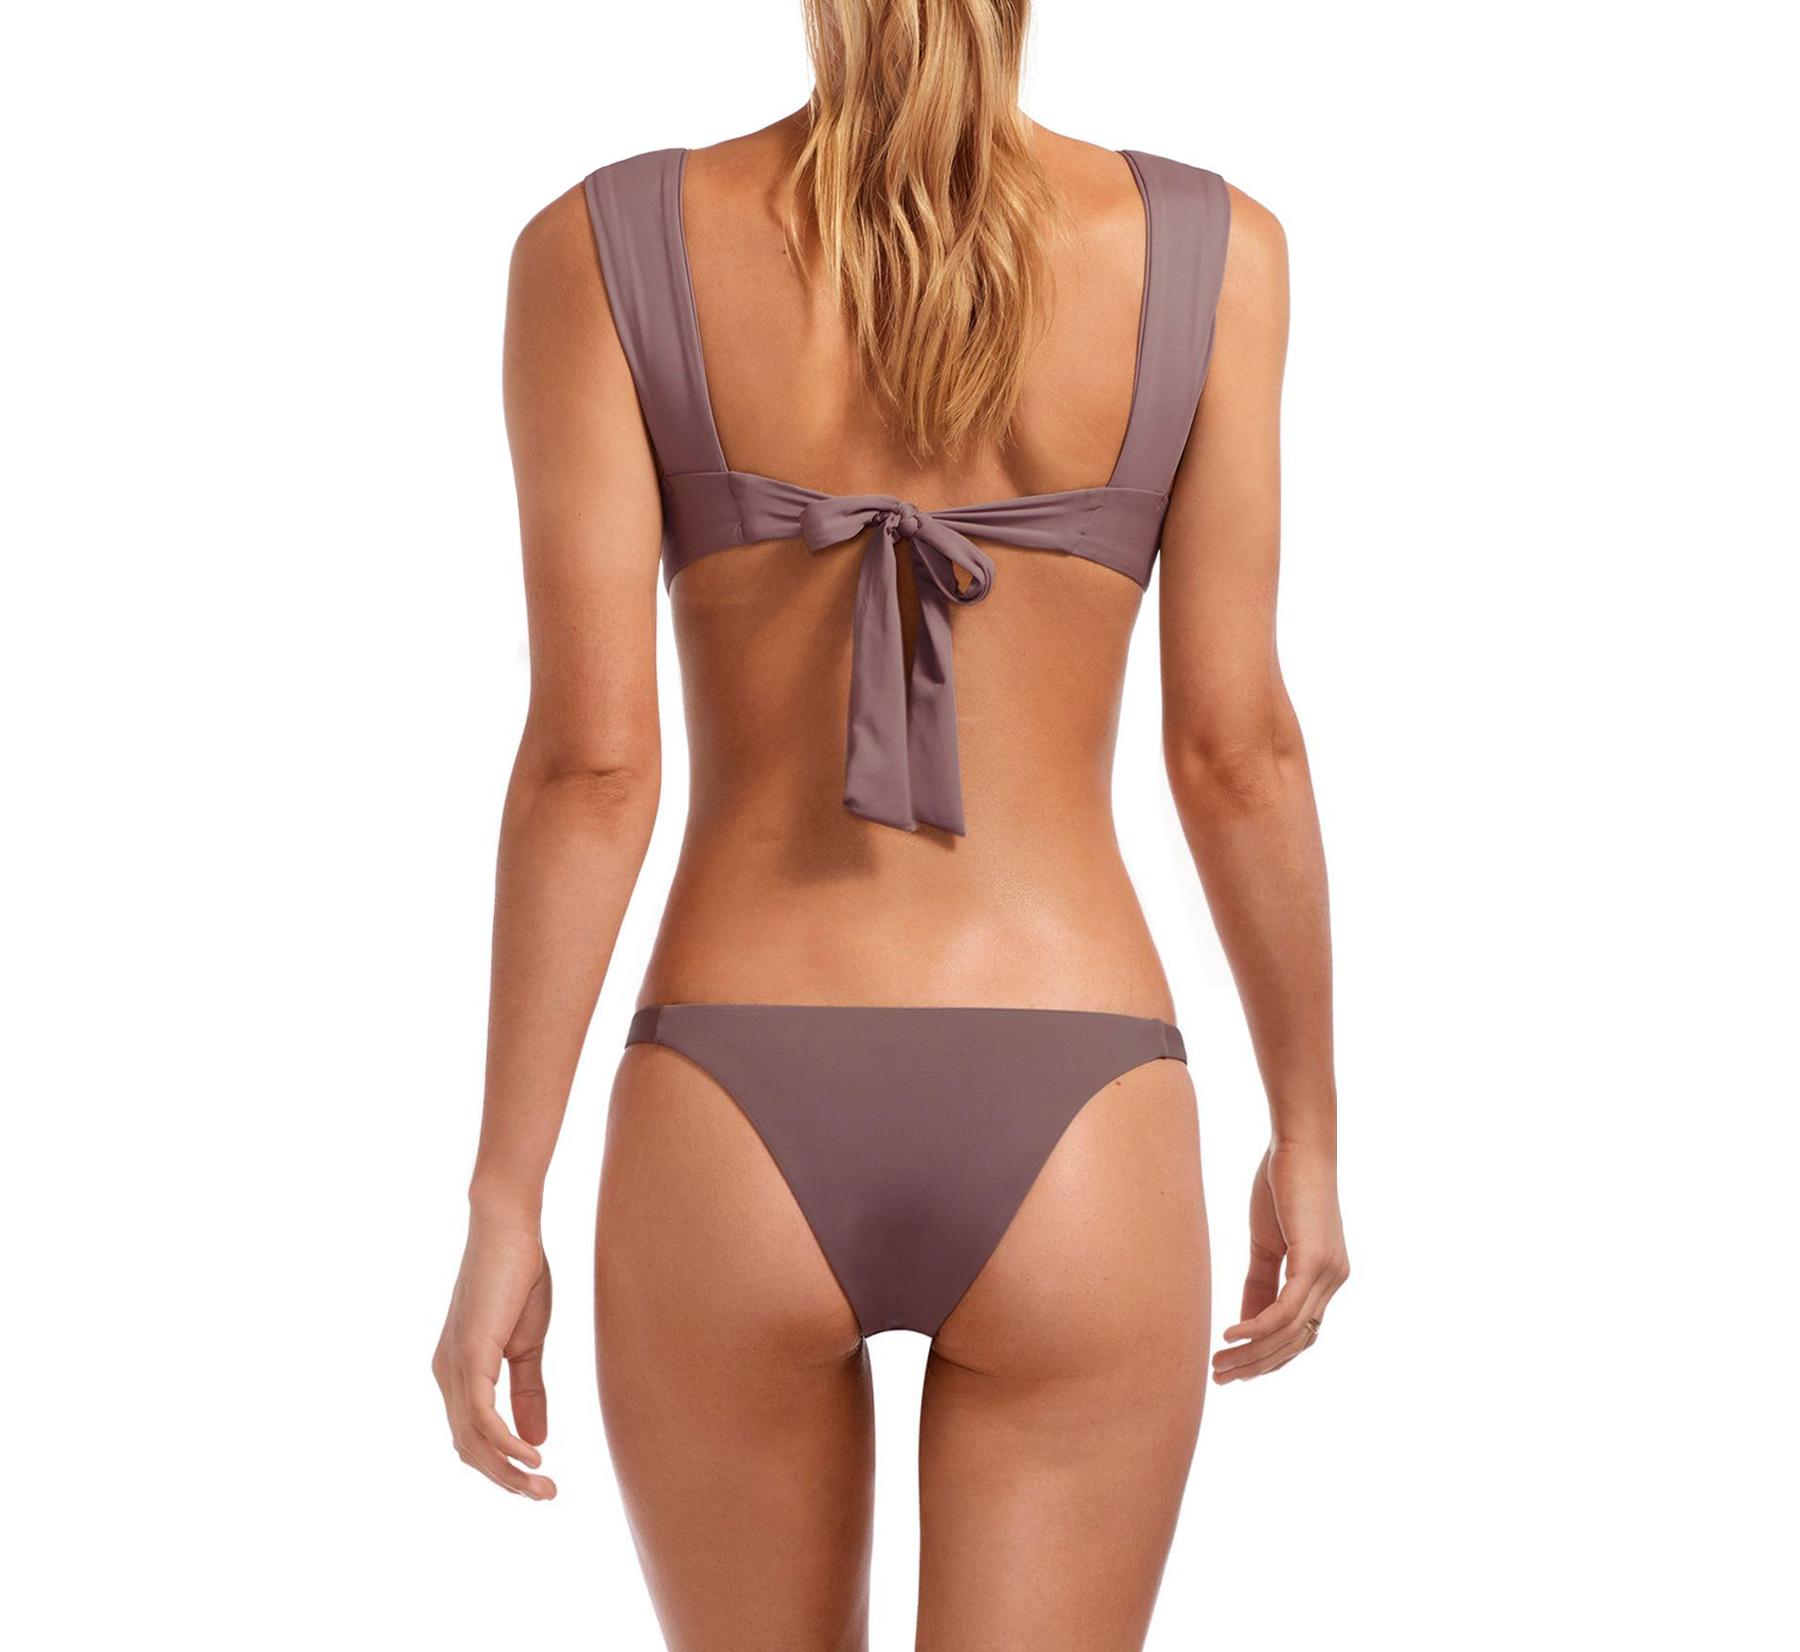 Galet Magnolia Carmen Bikini BACK